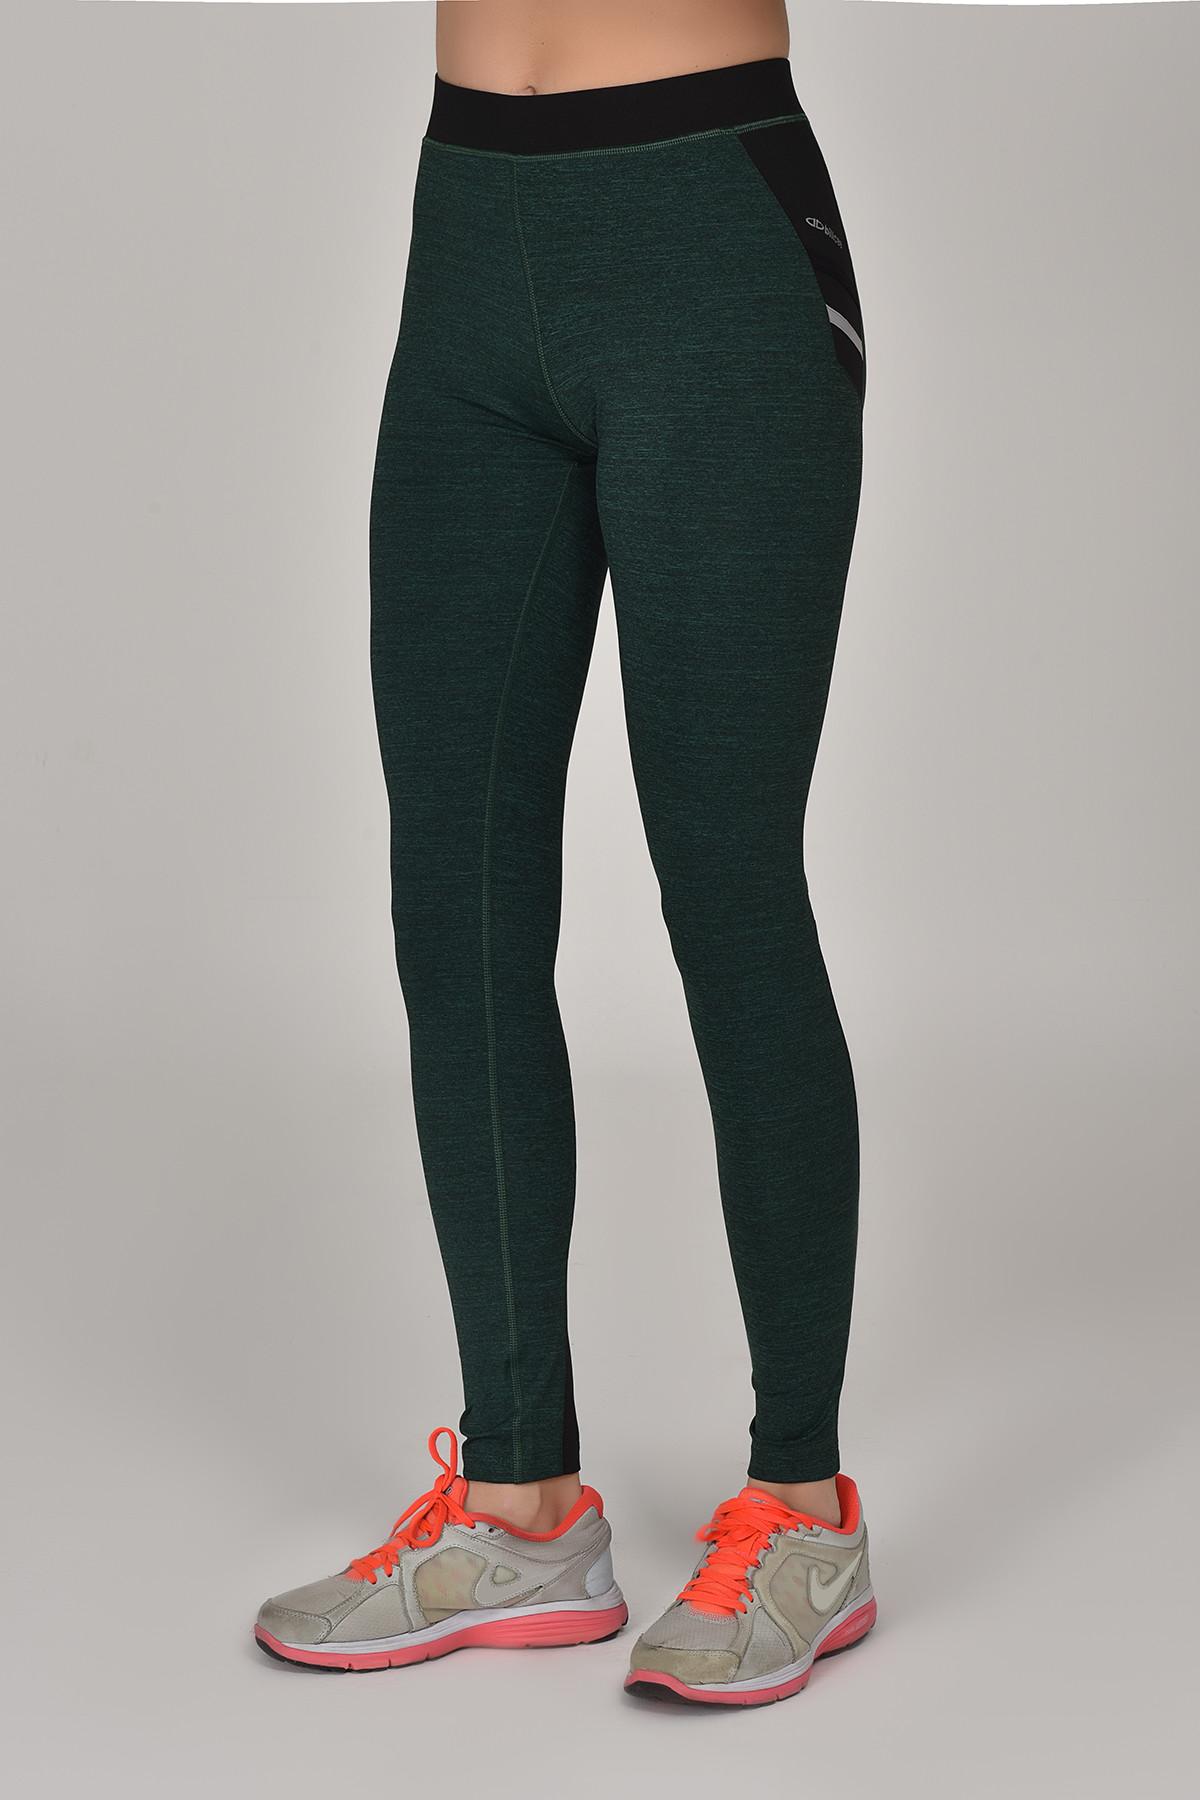 Bilcee Yeşil Kadın Sporcu Tayt AW-6570 BİLCEE